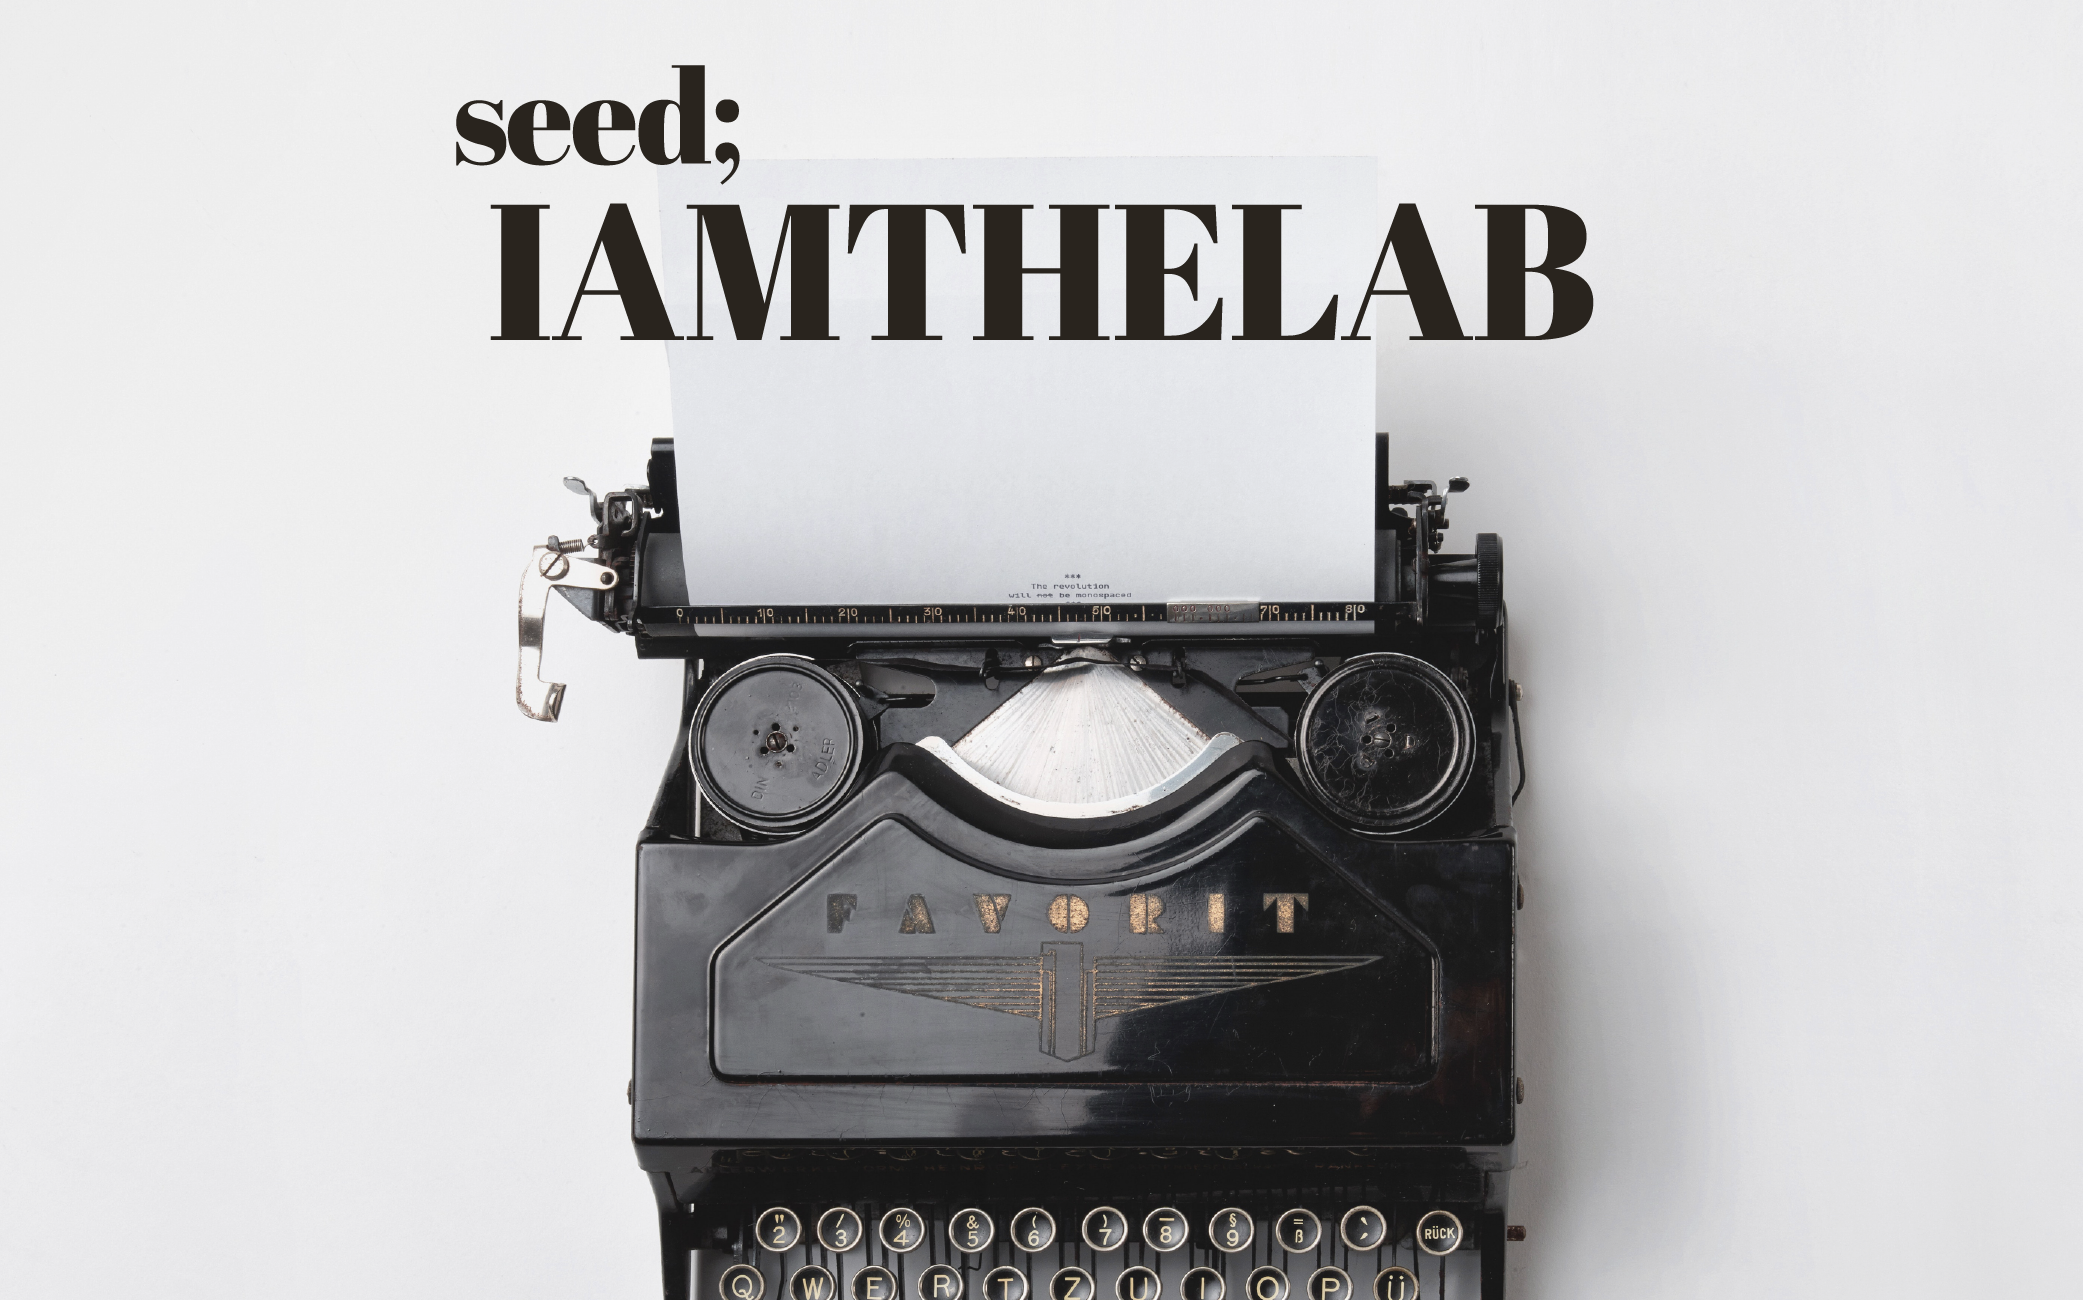 IAMTHELAB X Design Seeds | Seed Design Consultancy